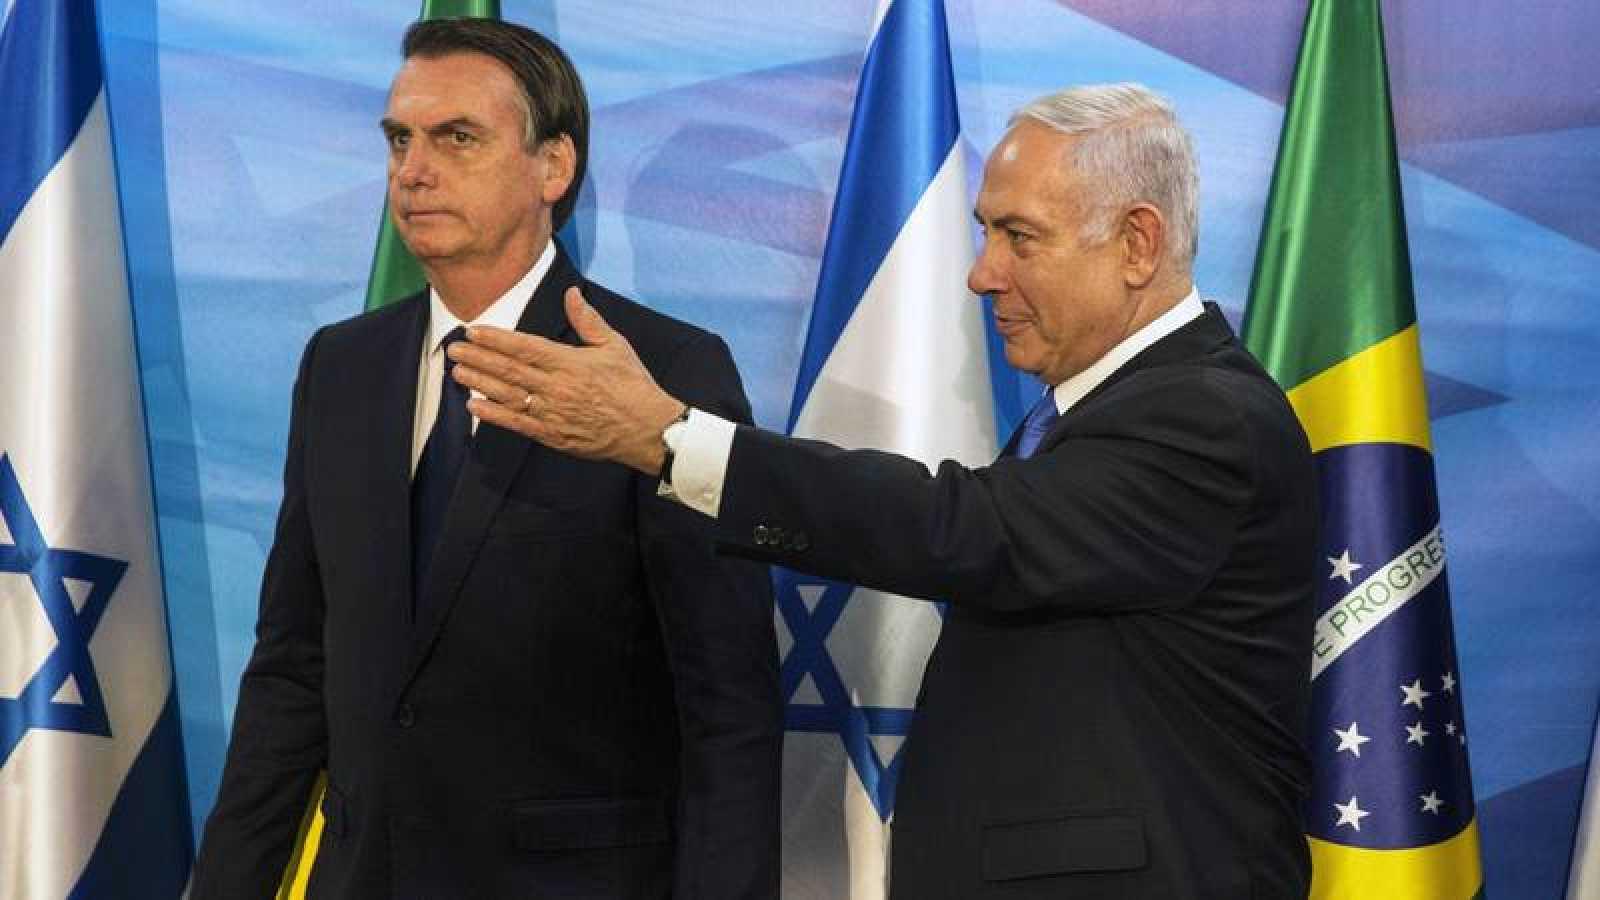 Bolsonaro abrirá oficina diplomática en Jerusalén